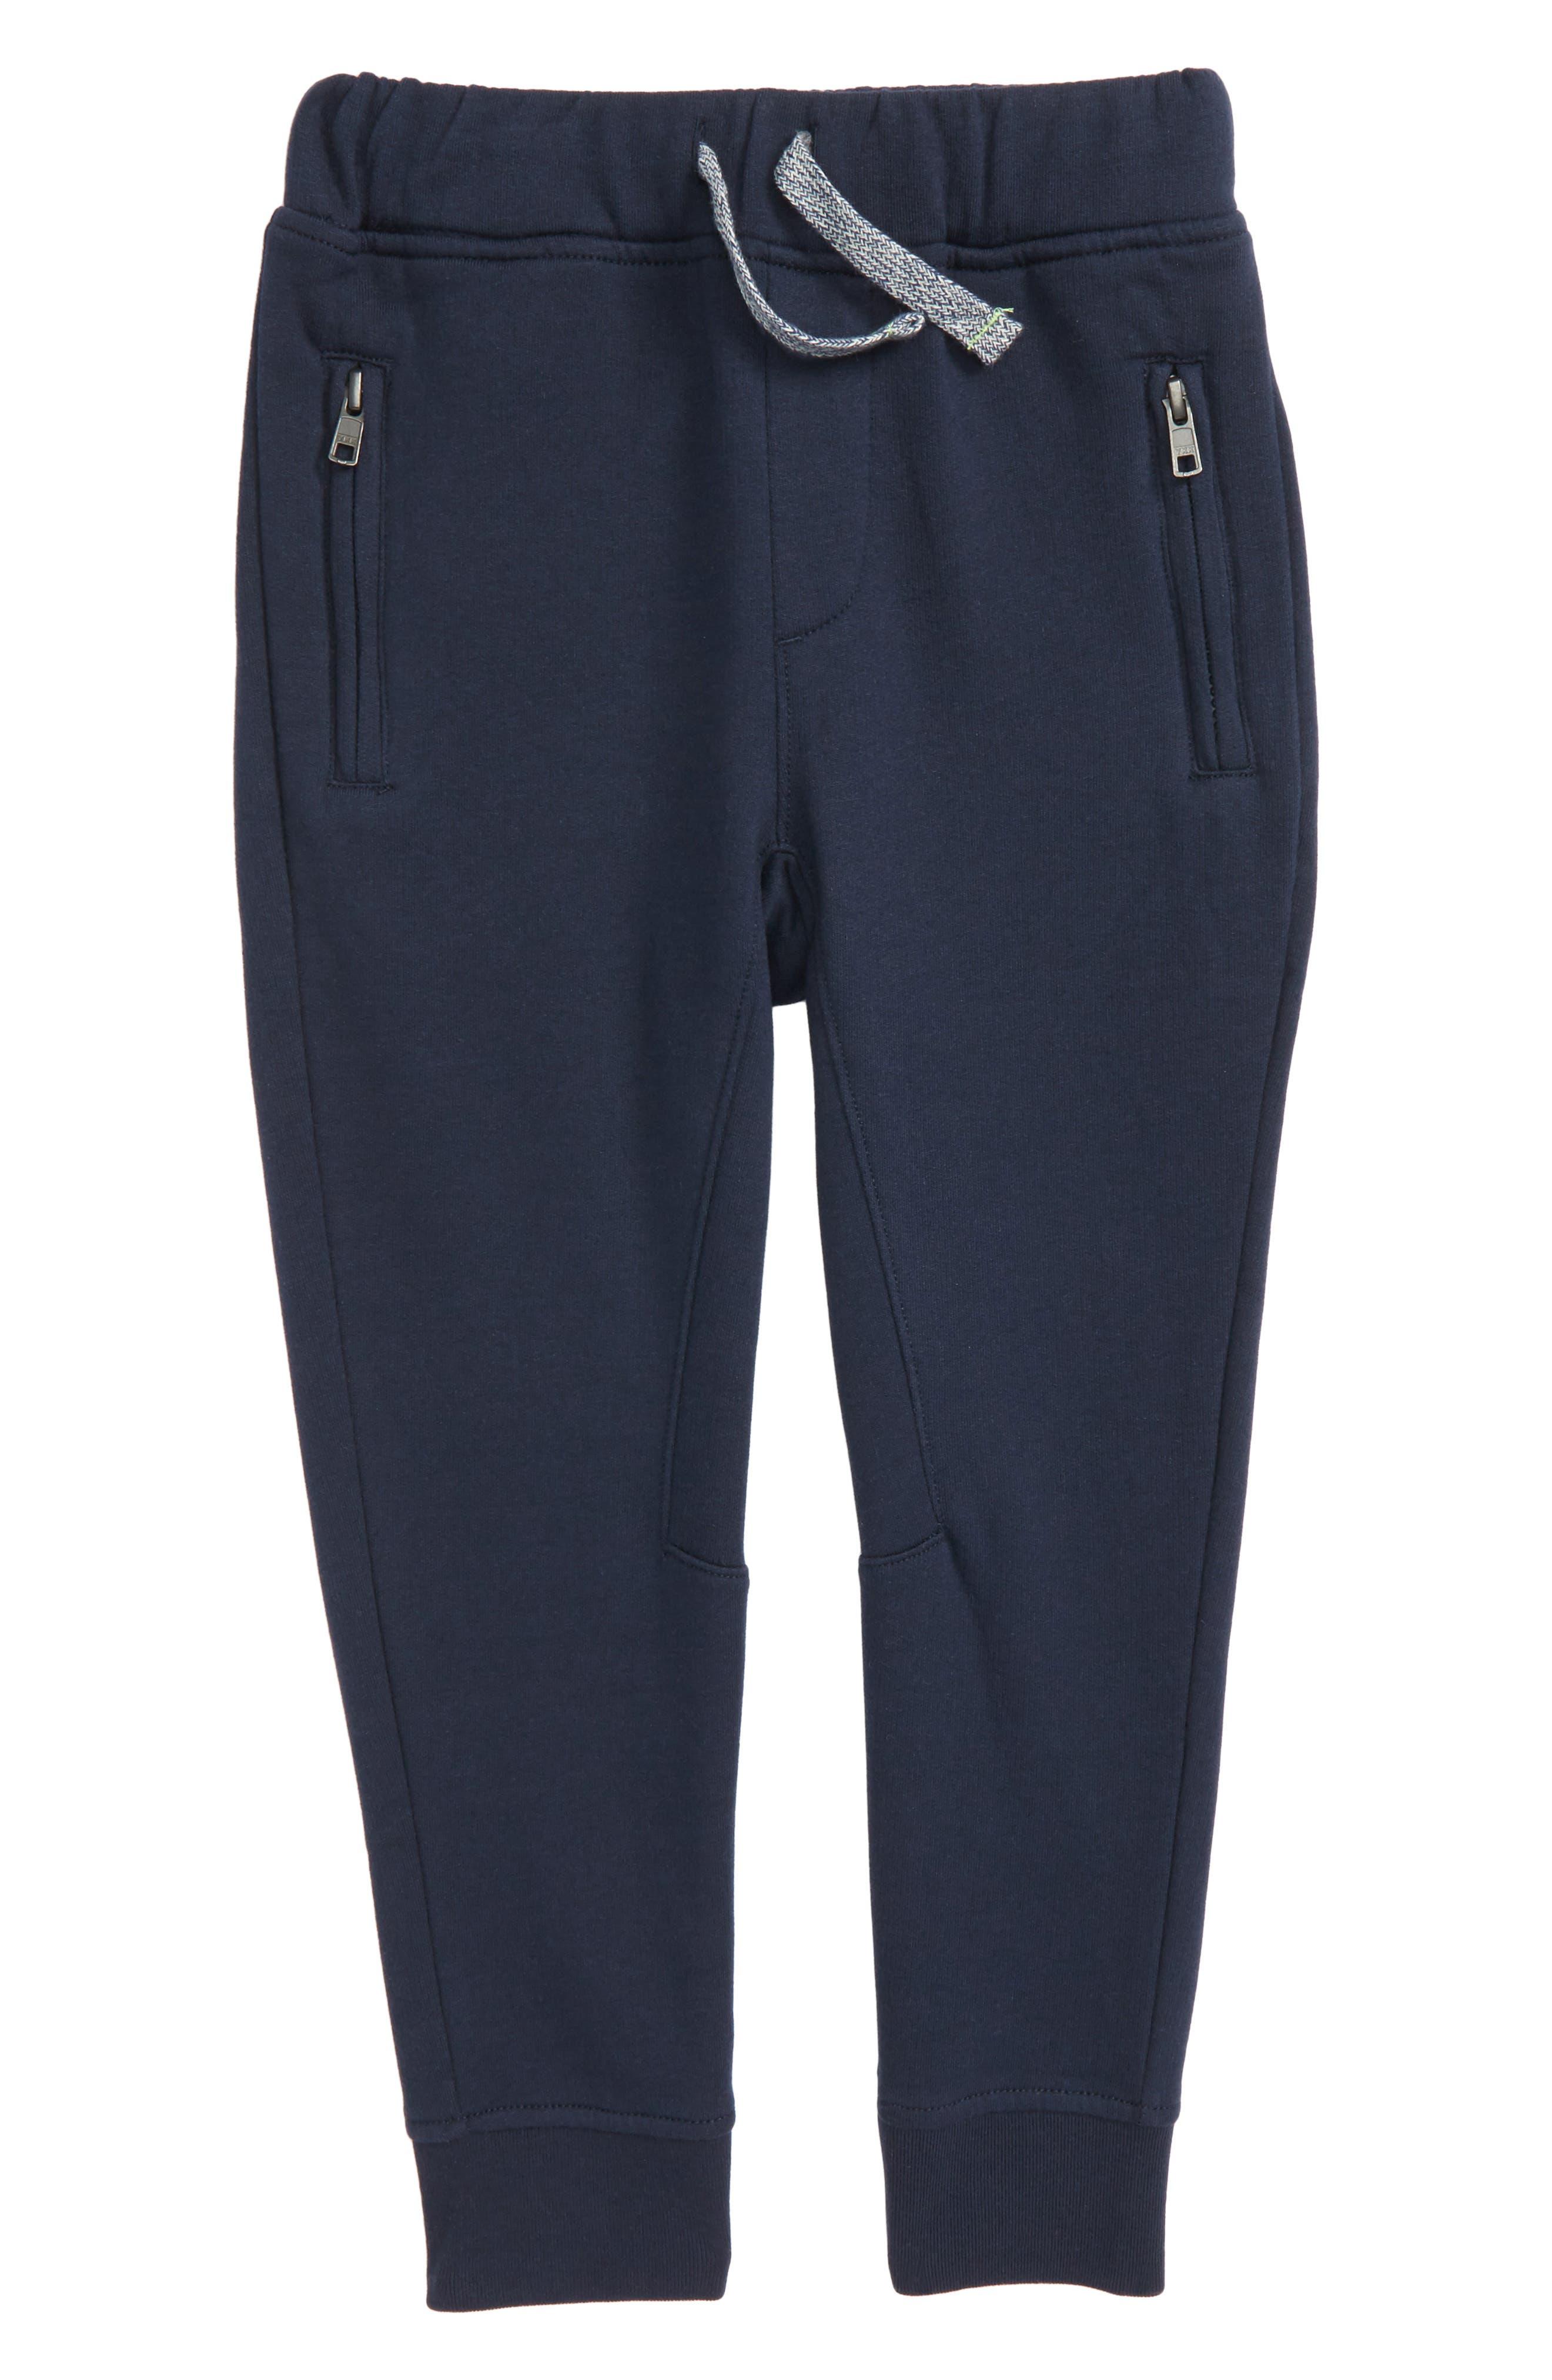 Boys Crewcuts By Jcrew Slim Jogger Pants Size 12  Blue